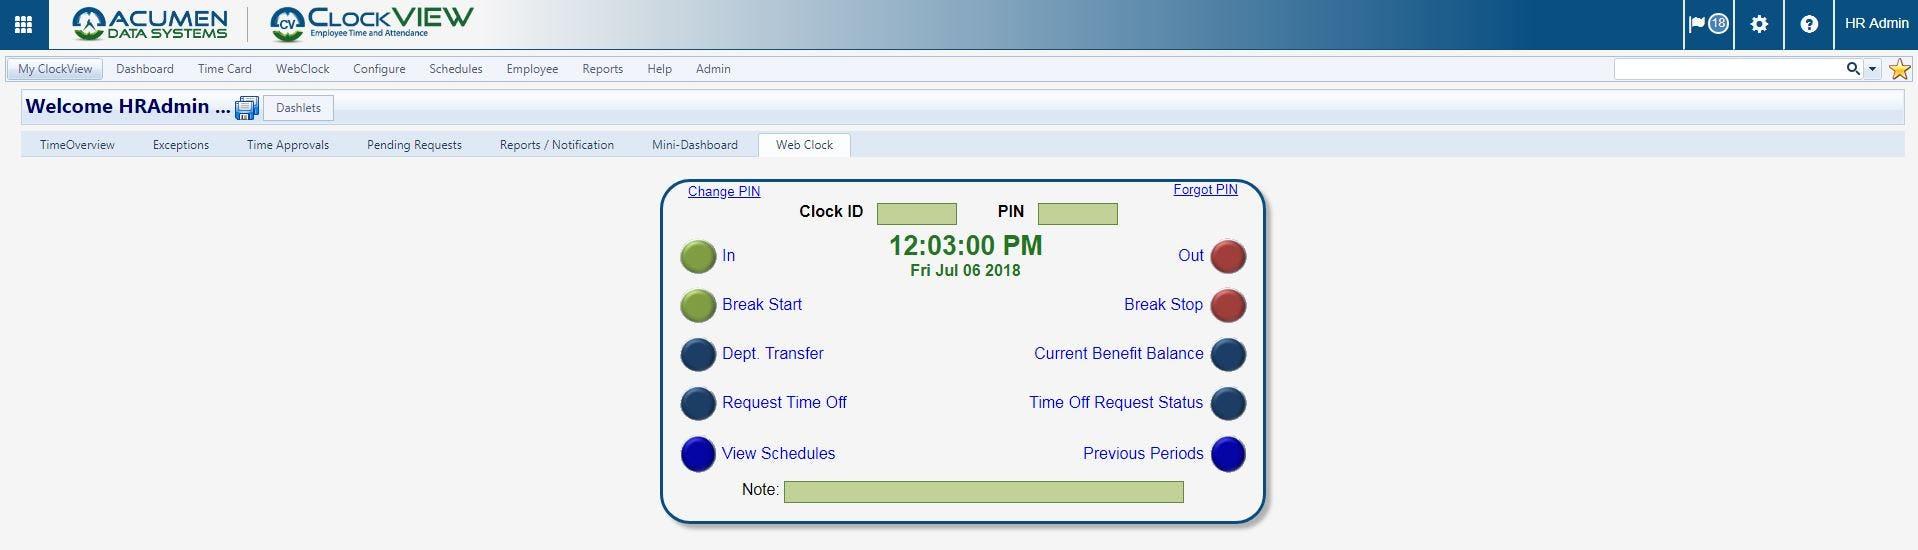 ClockVIEW Software - ClockVIEW web clock